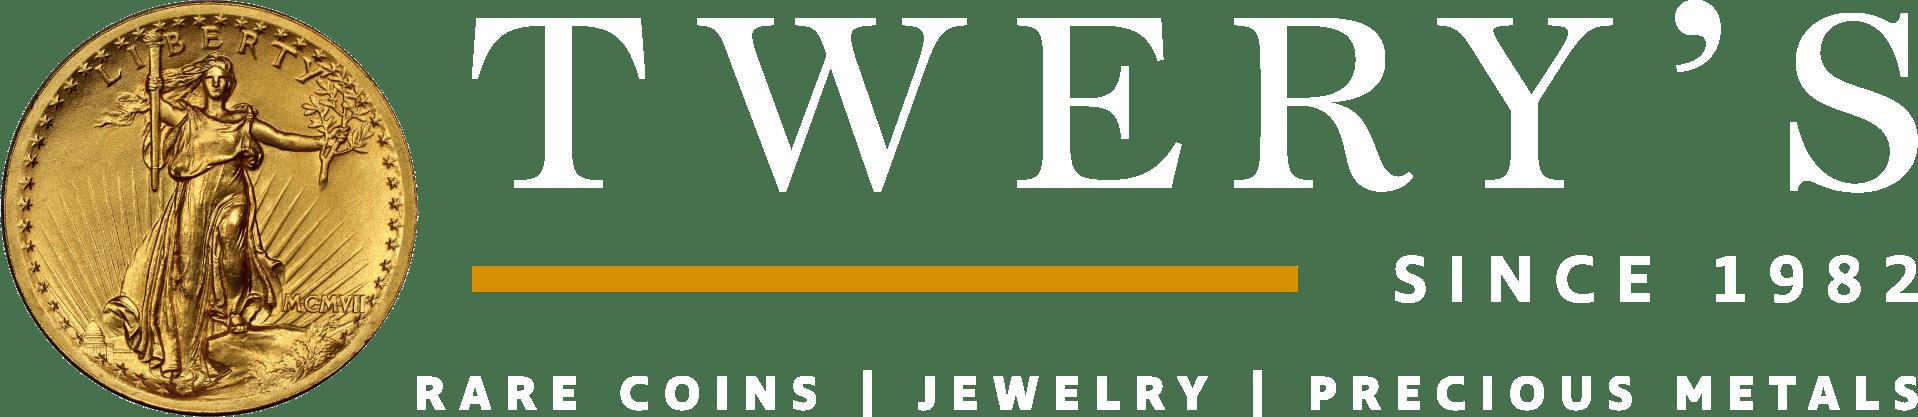 Twery's Logo